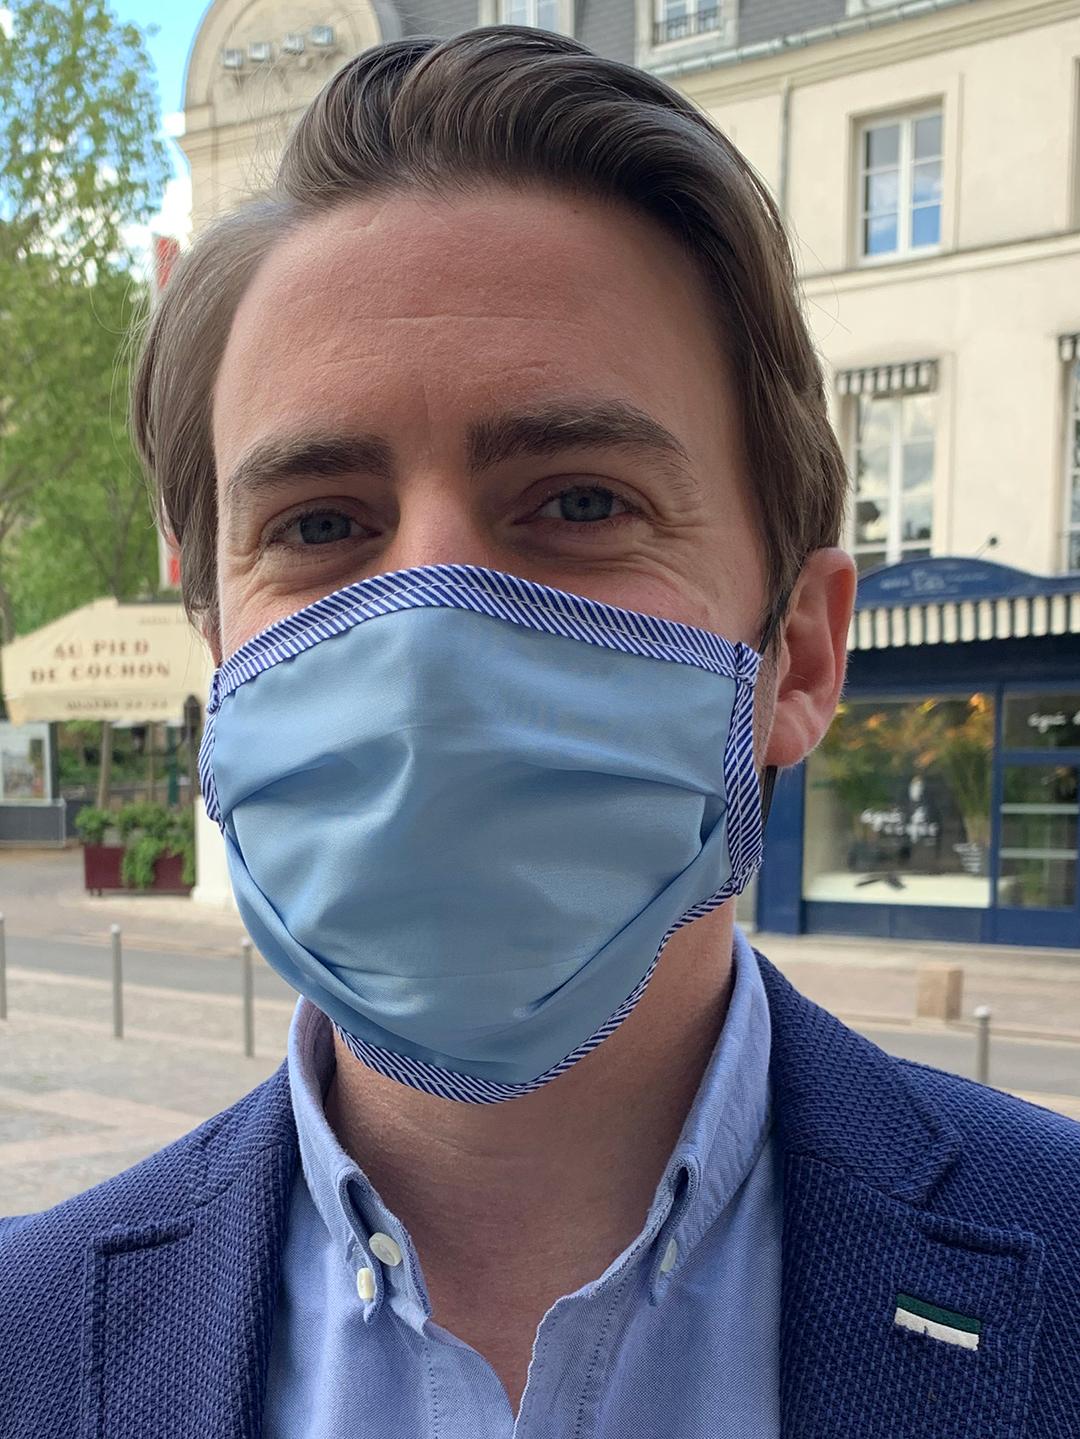 Masque de Protection Verso Bleu Ciel Gansé Rayé Homme